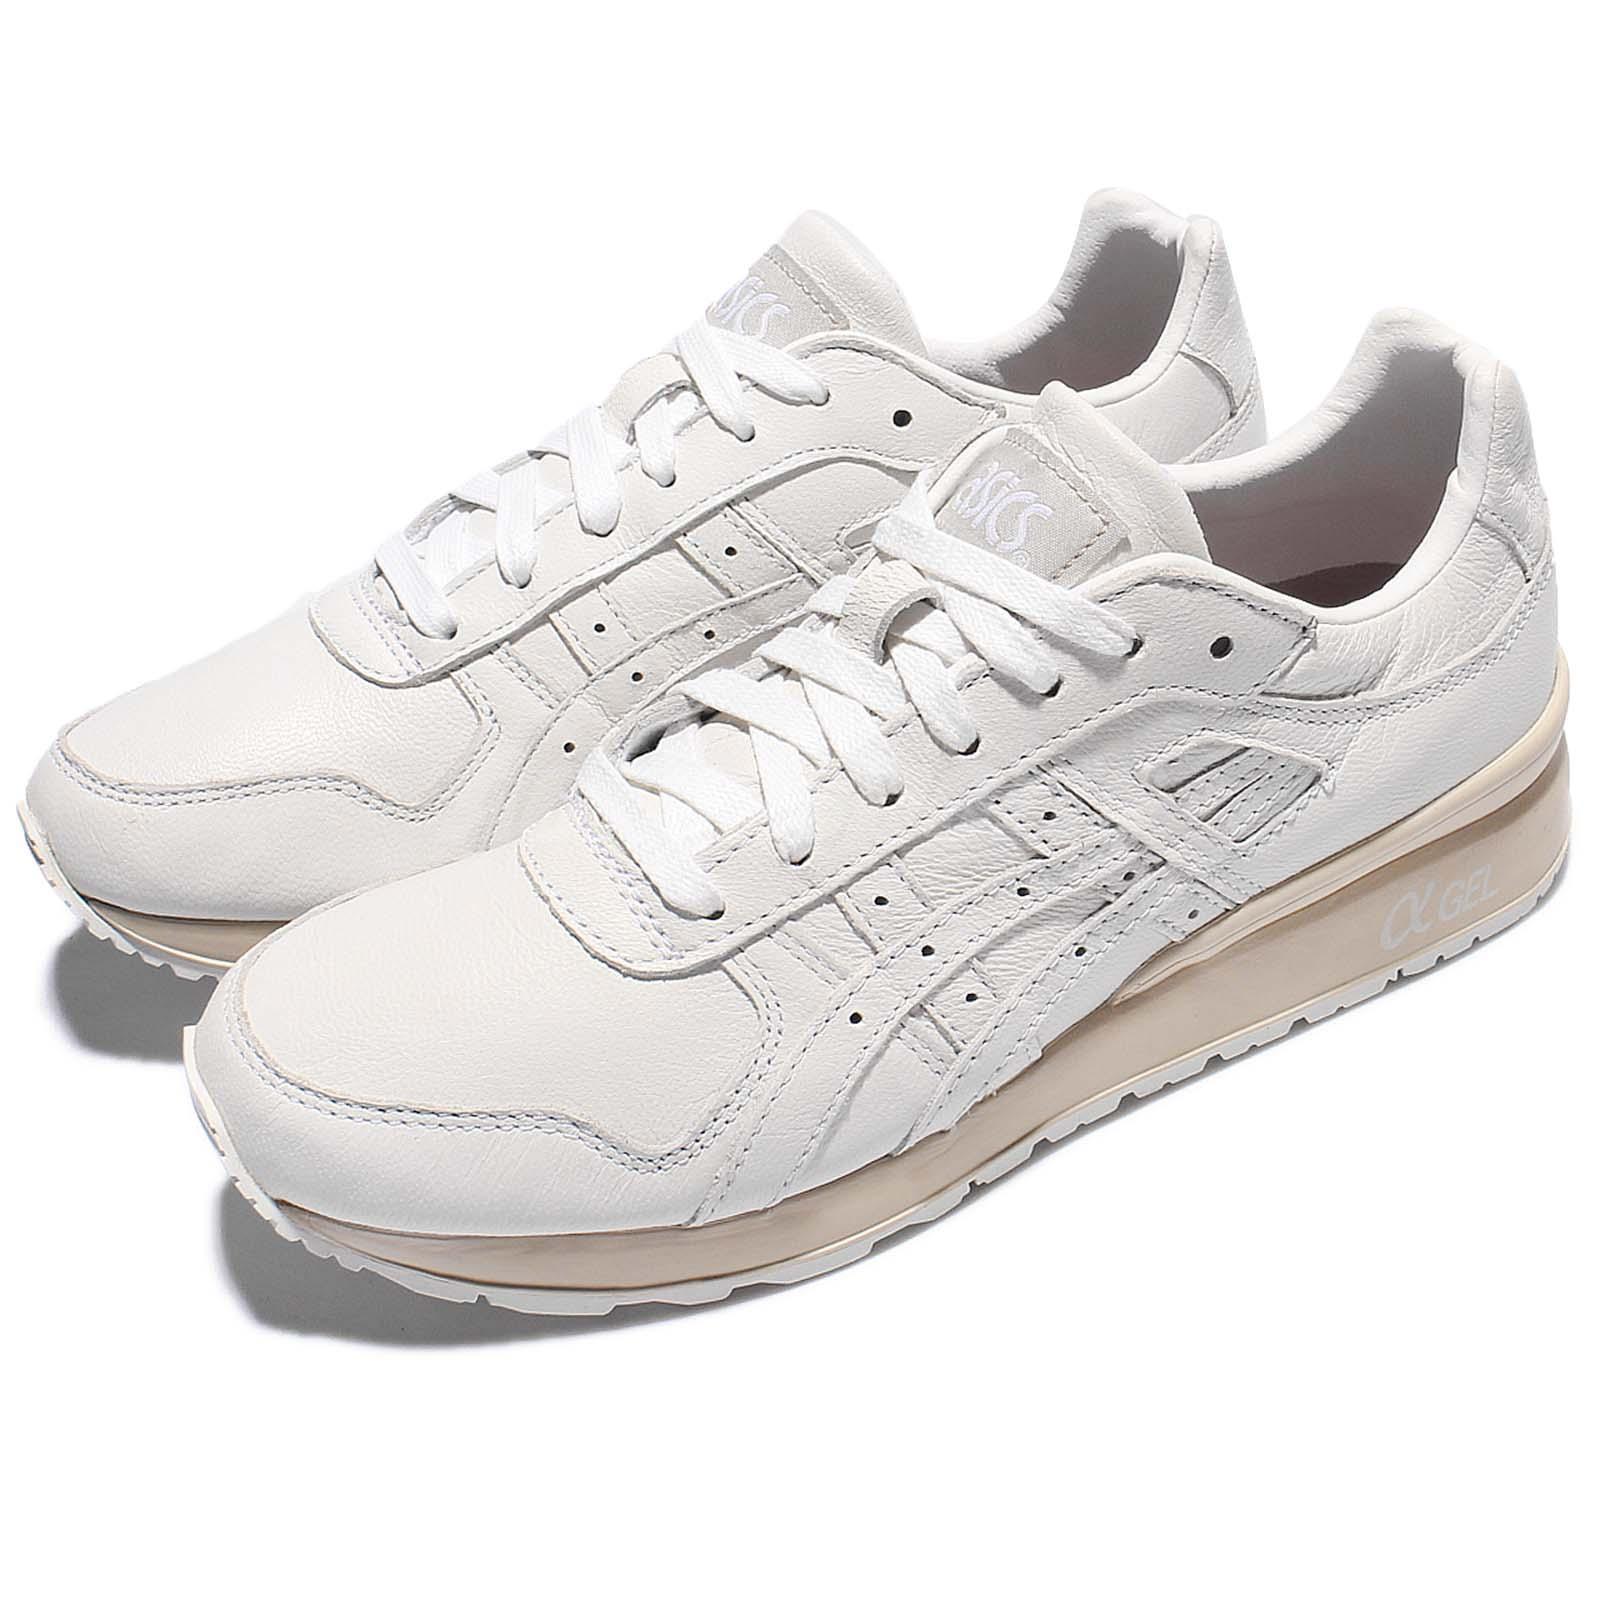 świetne oferty popularne sklepy 100% autentyczny Details about Asics Tiger GT-II 2 White Leather Khaki Gel Retro Men Shoes  Sneakers H7L2L-0101